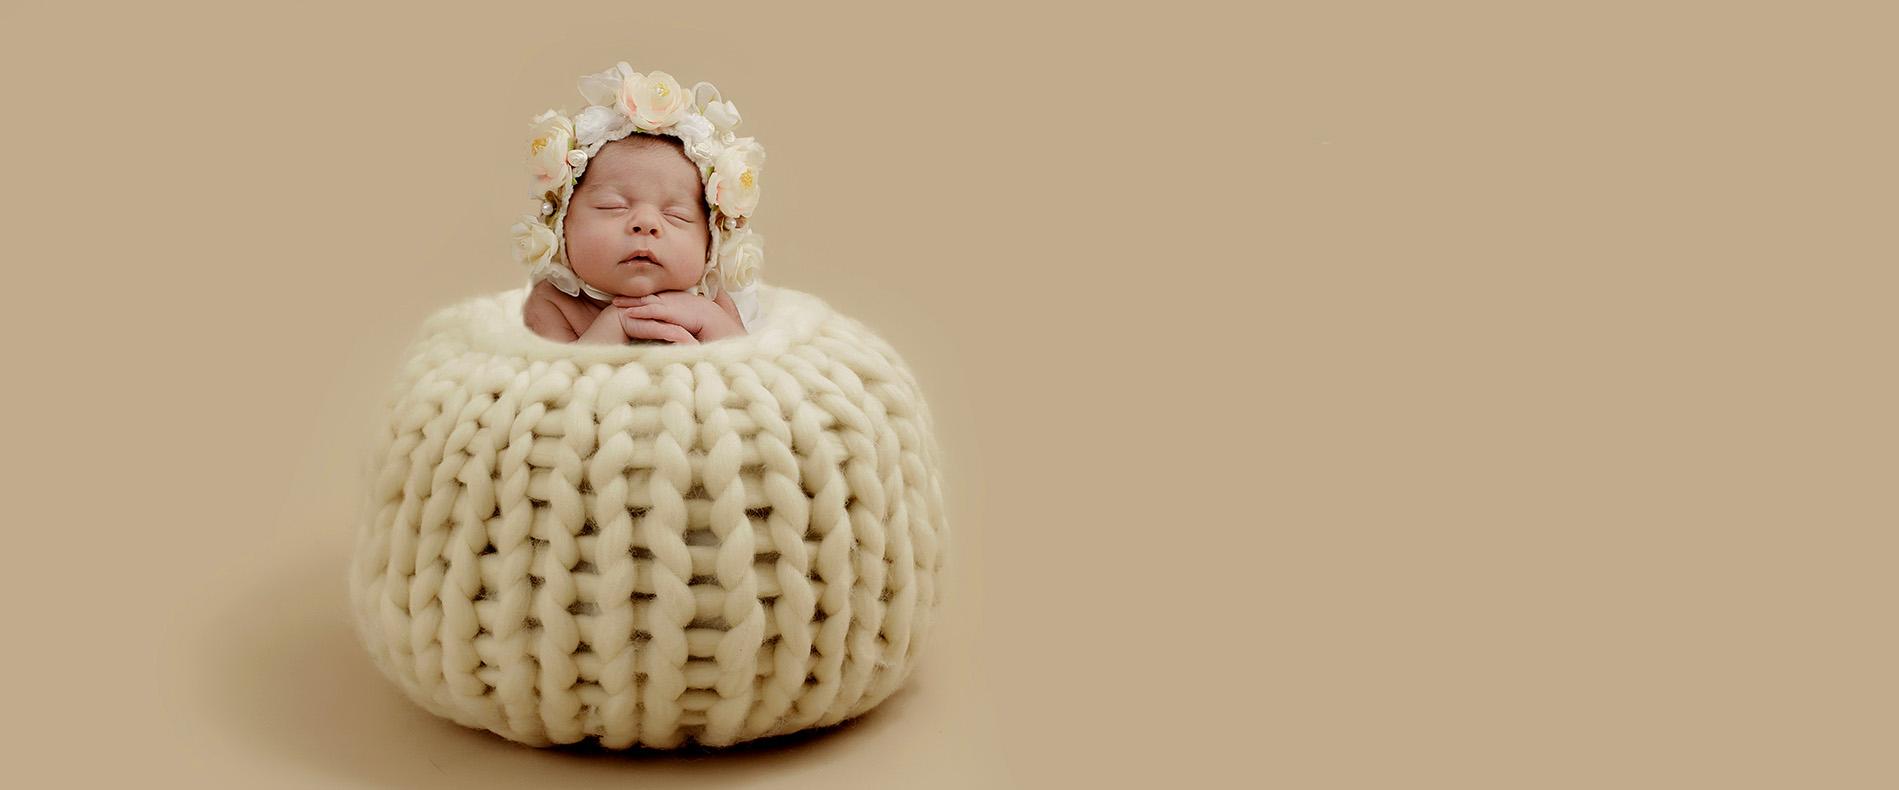 photos naissance